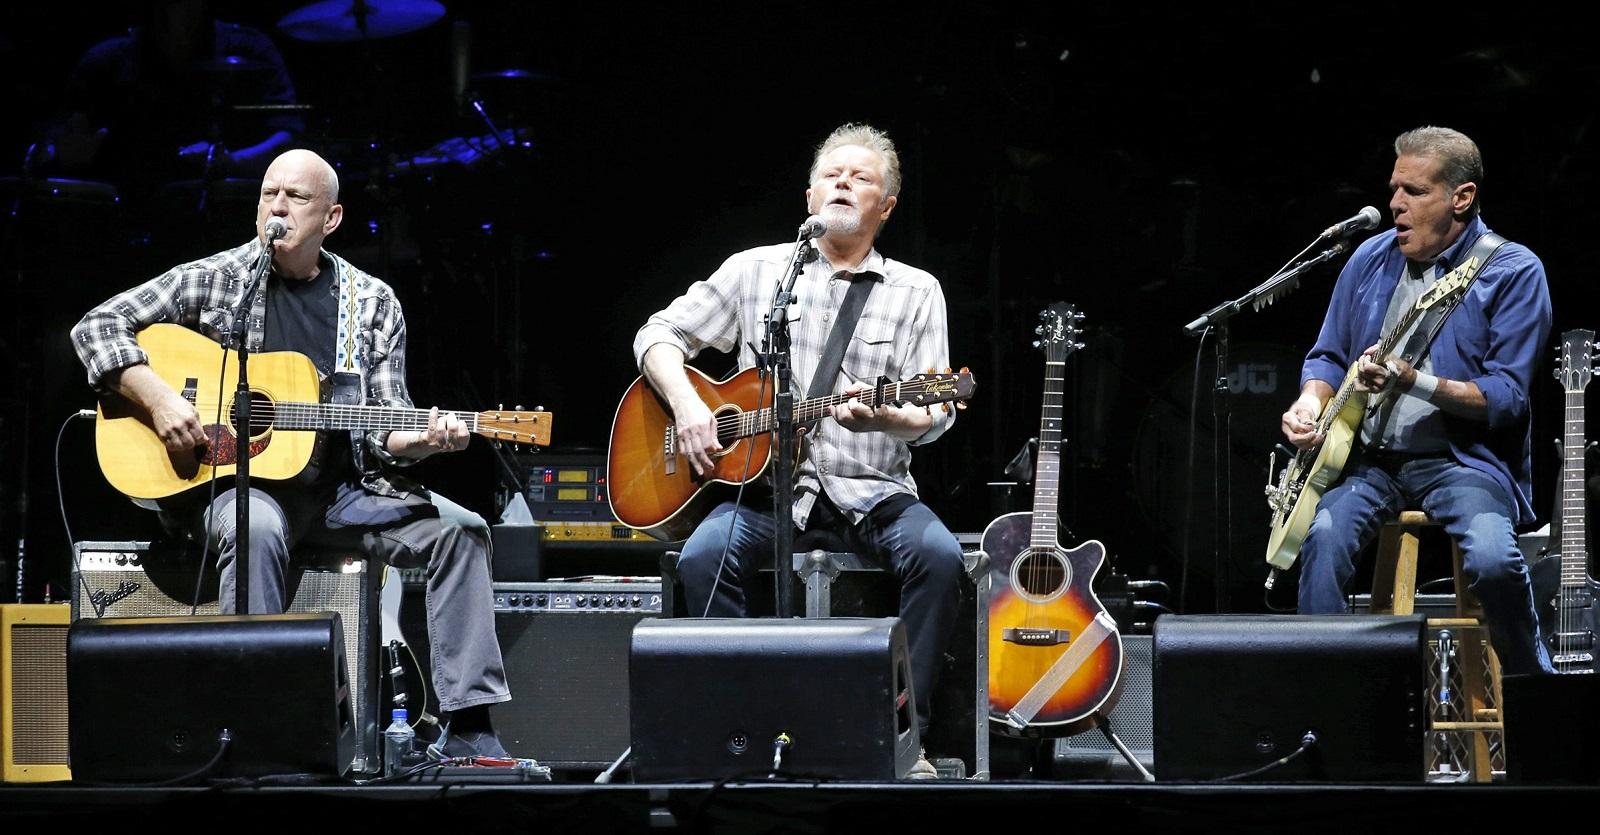 Eagles, from left, Bernie Leadon, Don Henley, Glenn Frey perform at the First Niagara Center.  (Harry Scull Jr./Buffalo News)